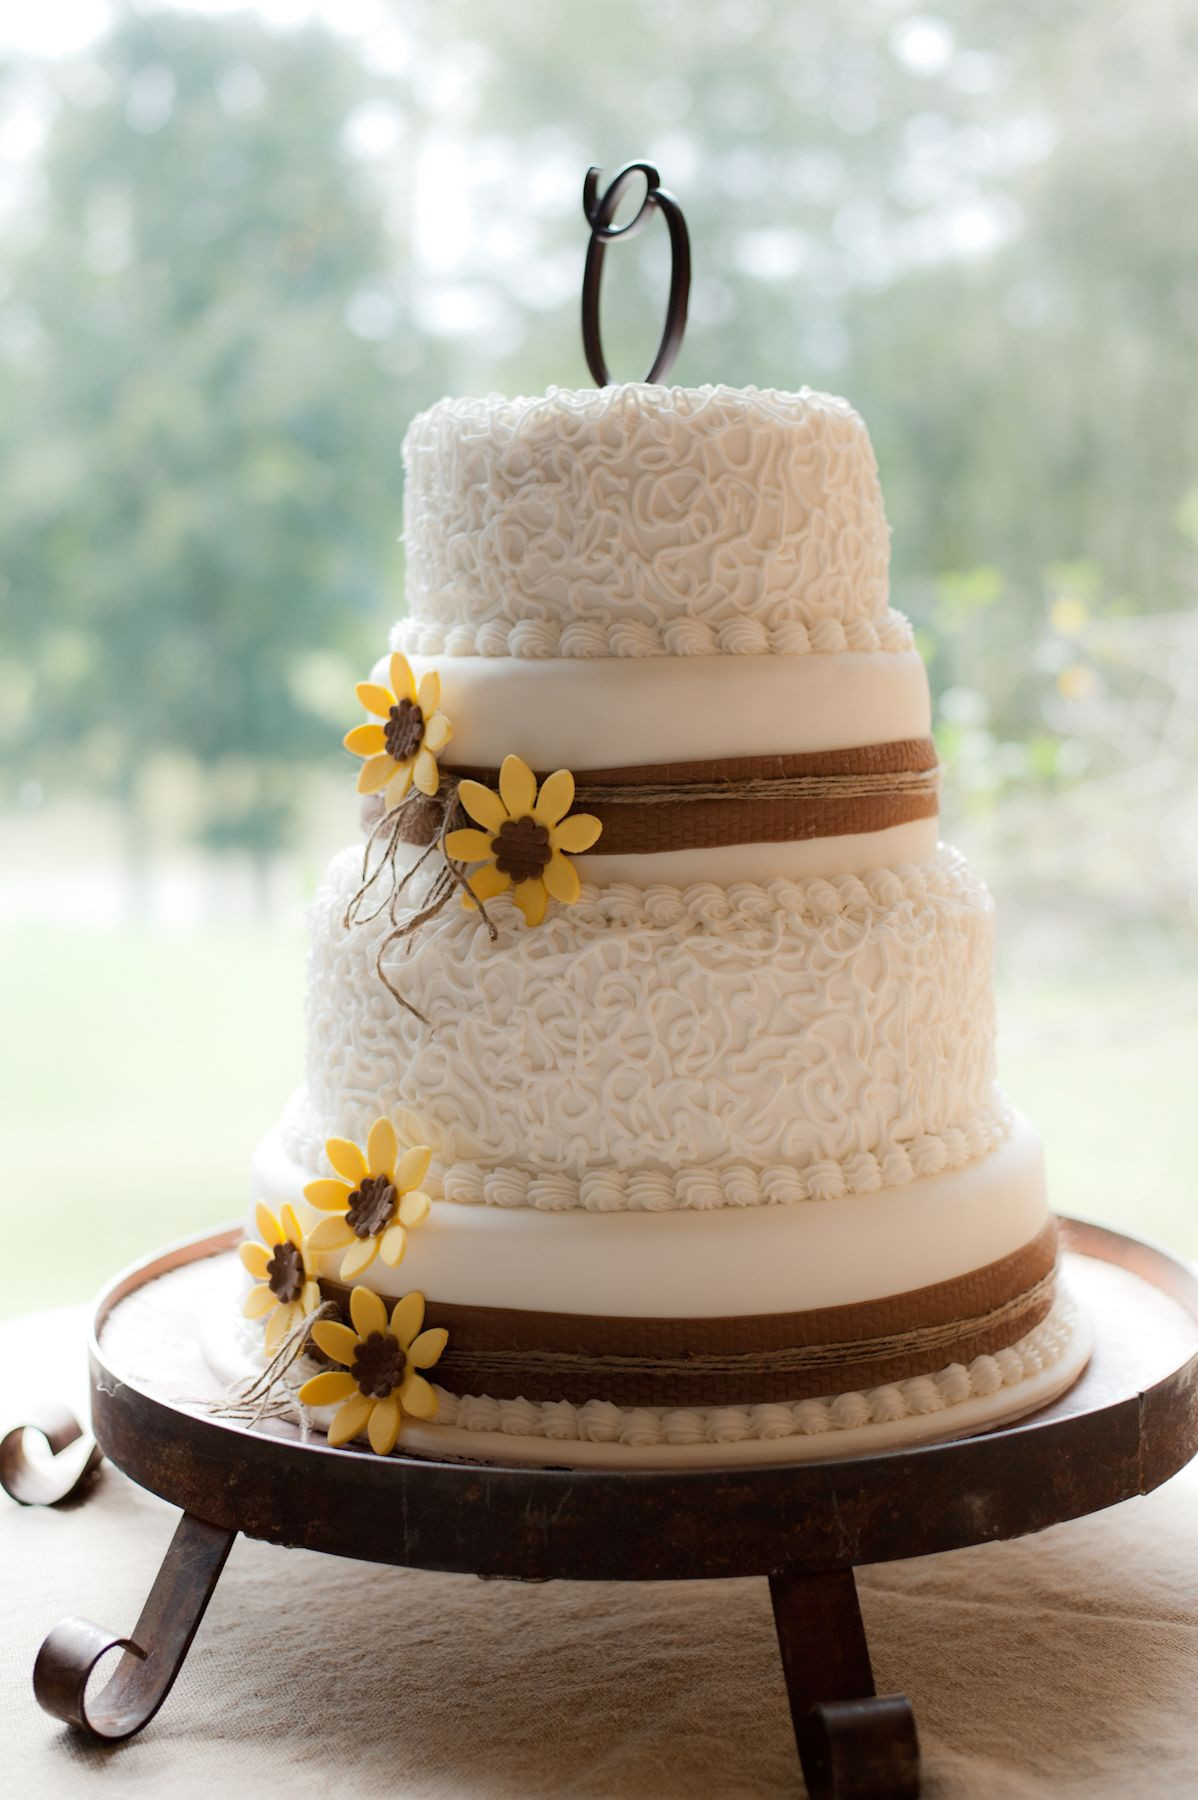 Rustic Wedding Cakes With Burlap  sunflower and burlap wedding cake